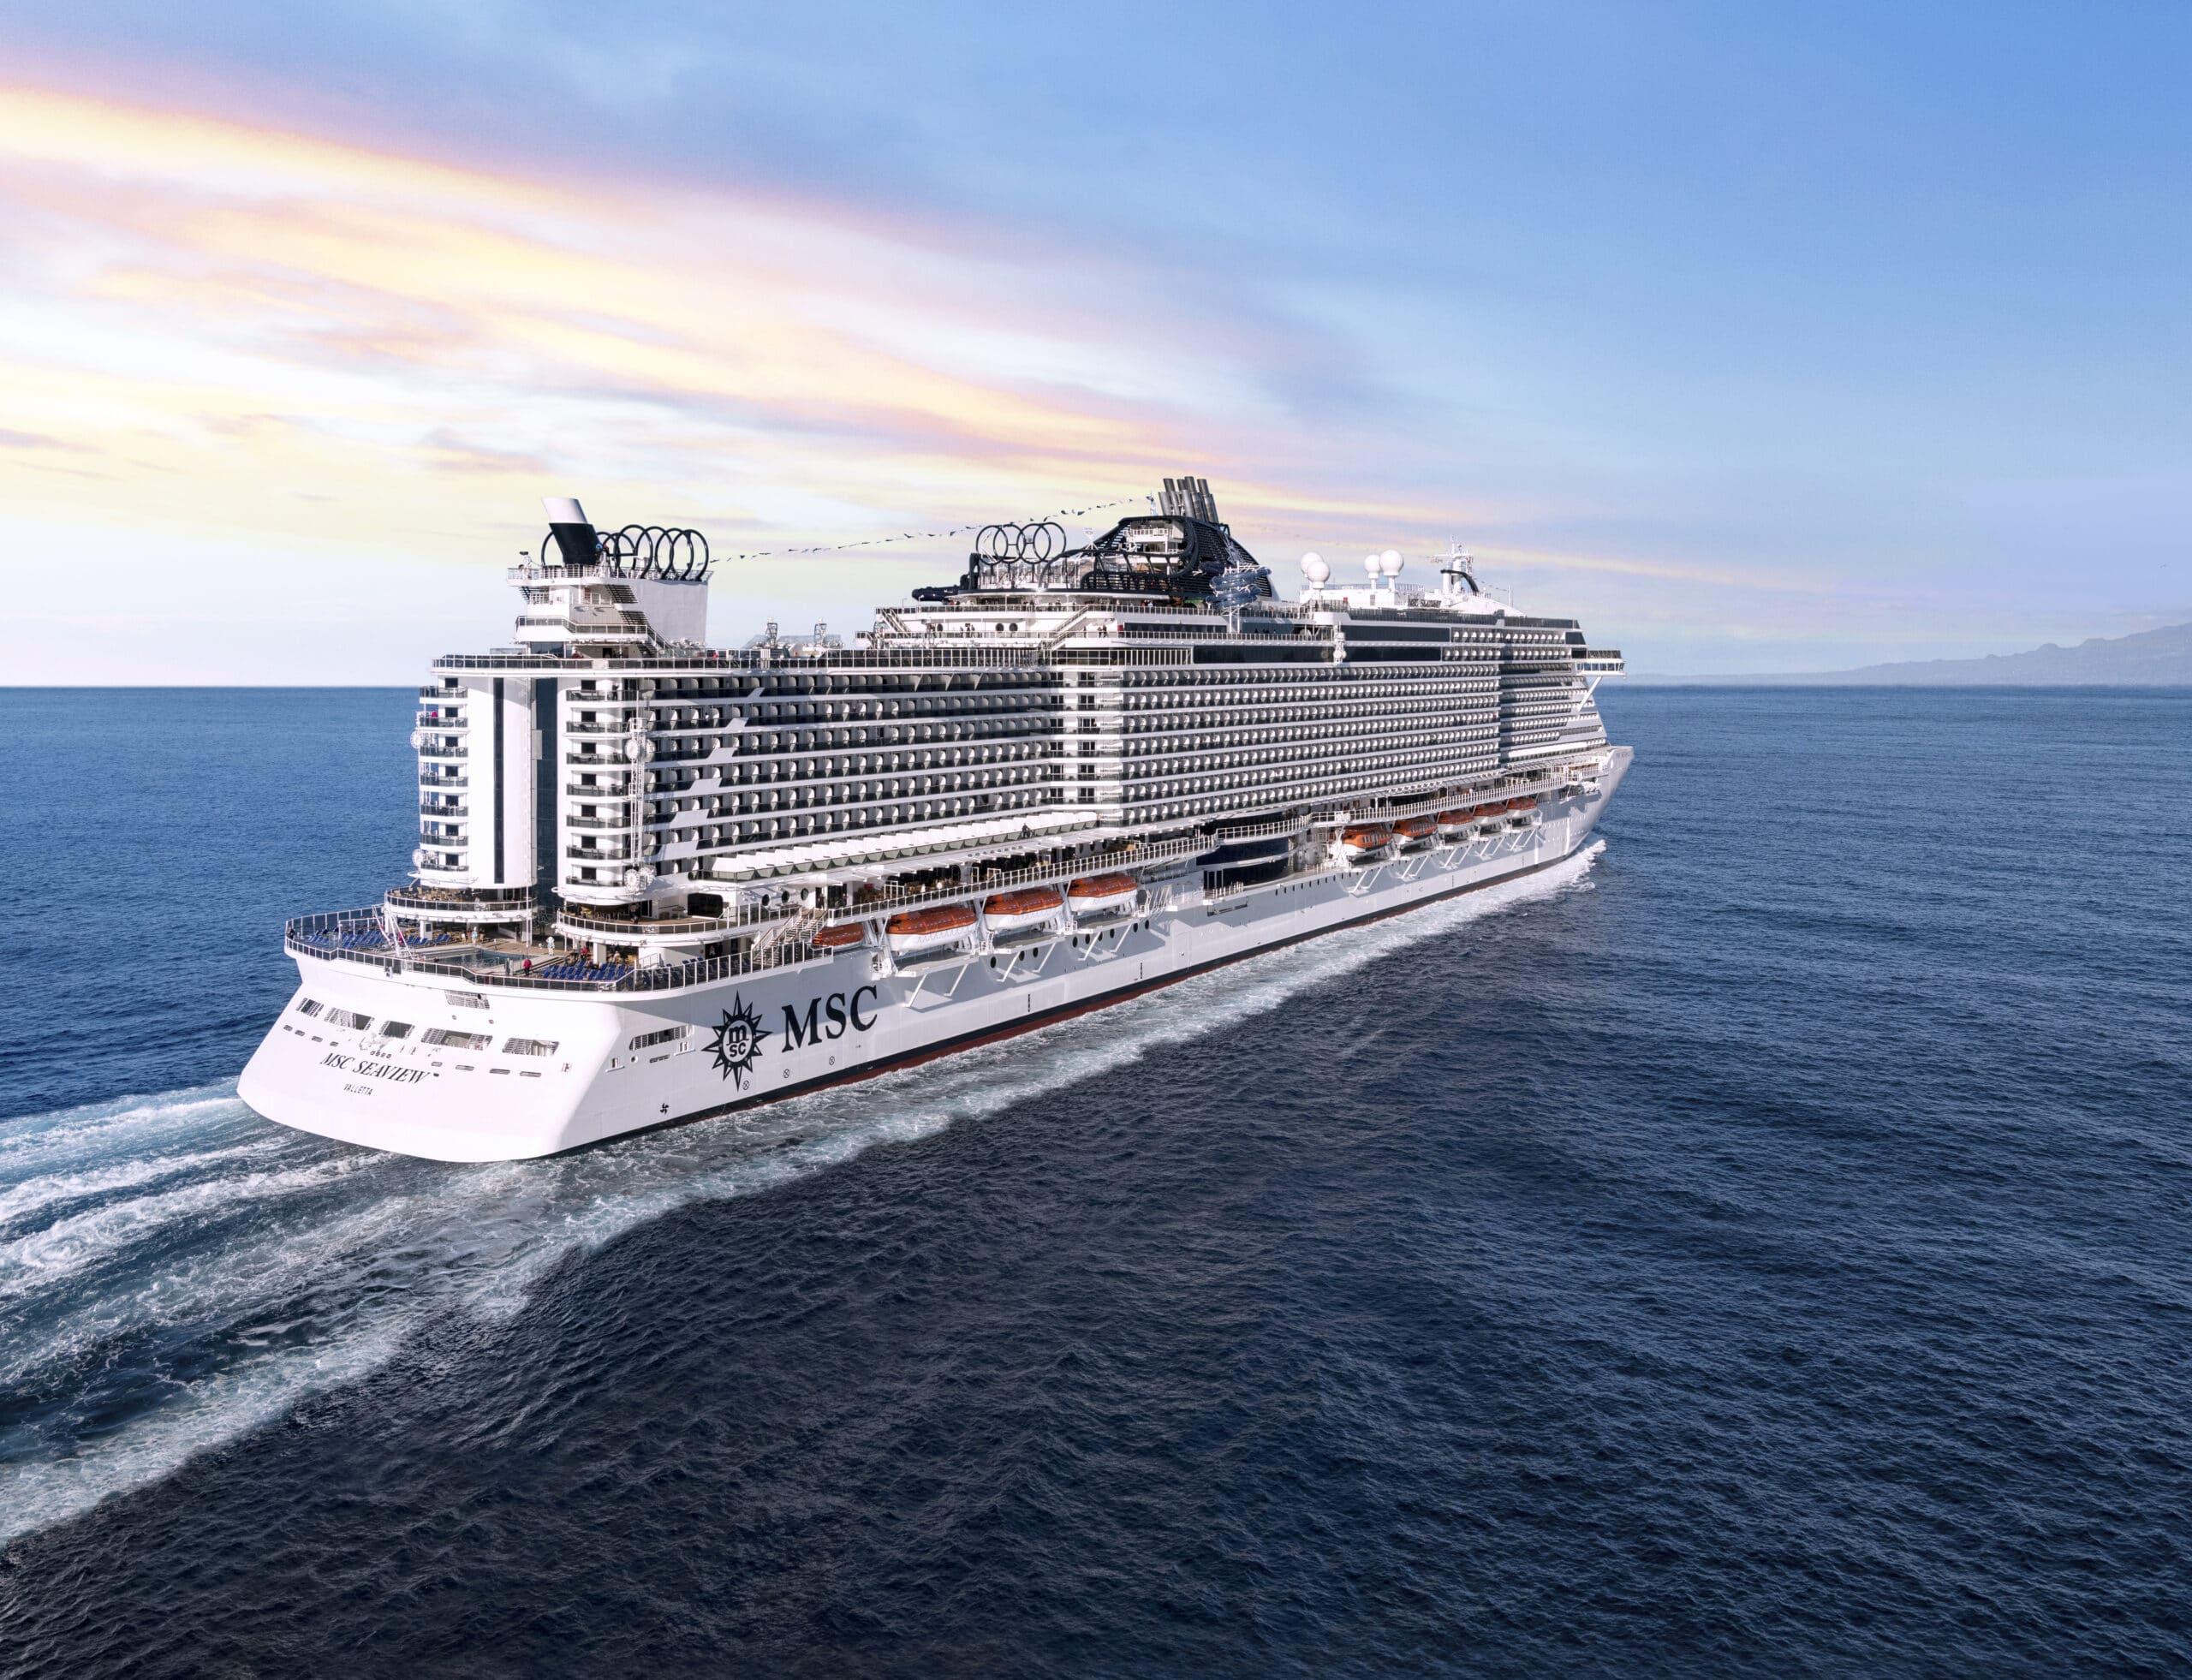 Cruiseschip-MSC Seaview-MSC Cruises-Schip